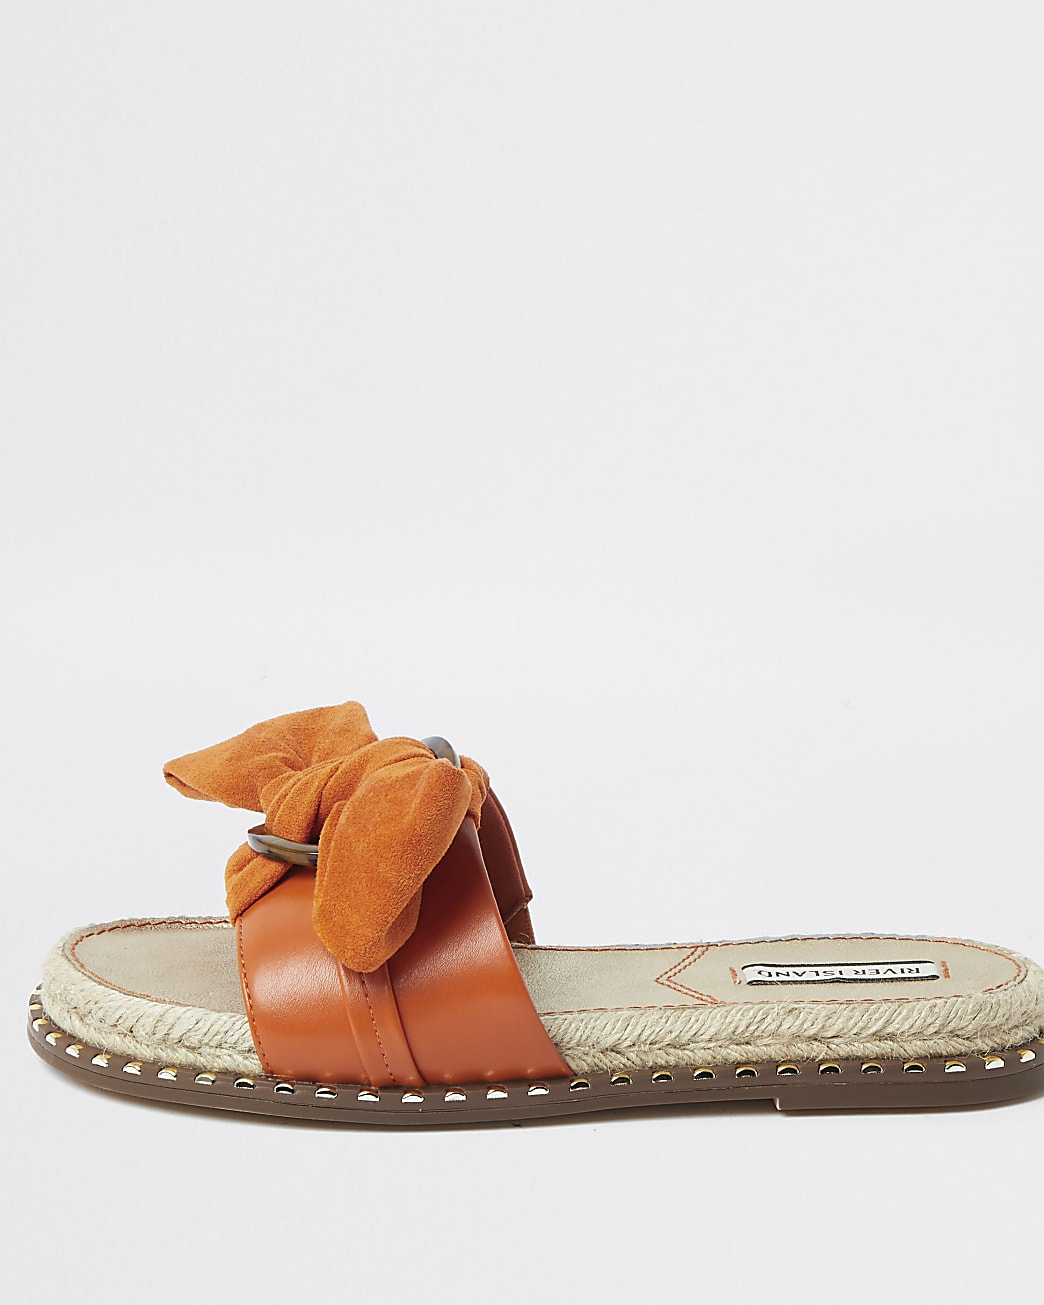 Orange espadrille bow sandal